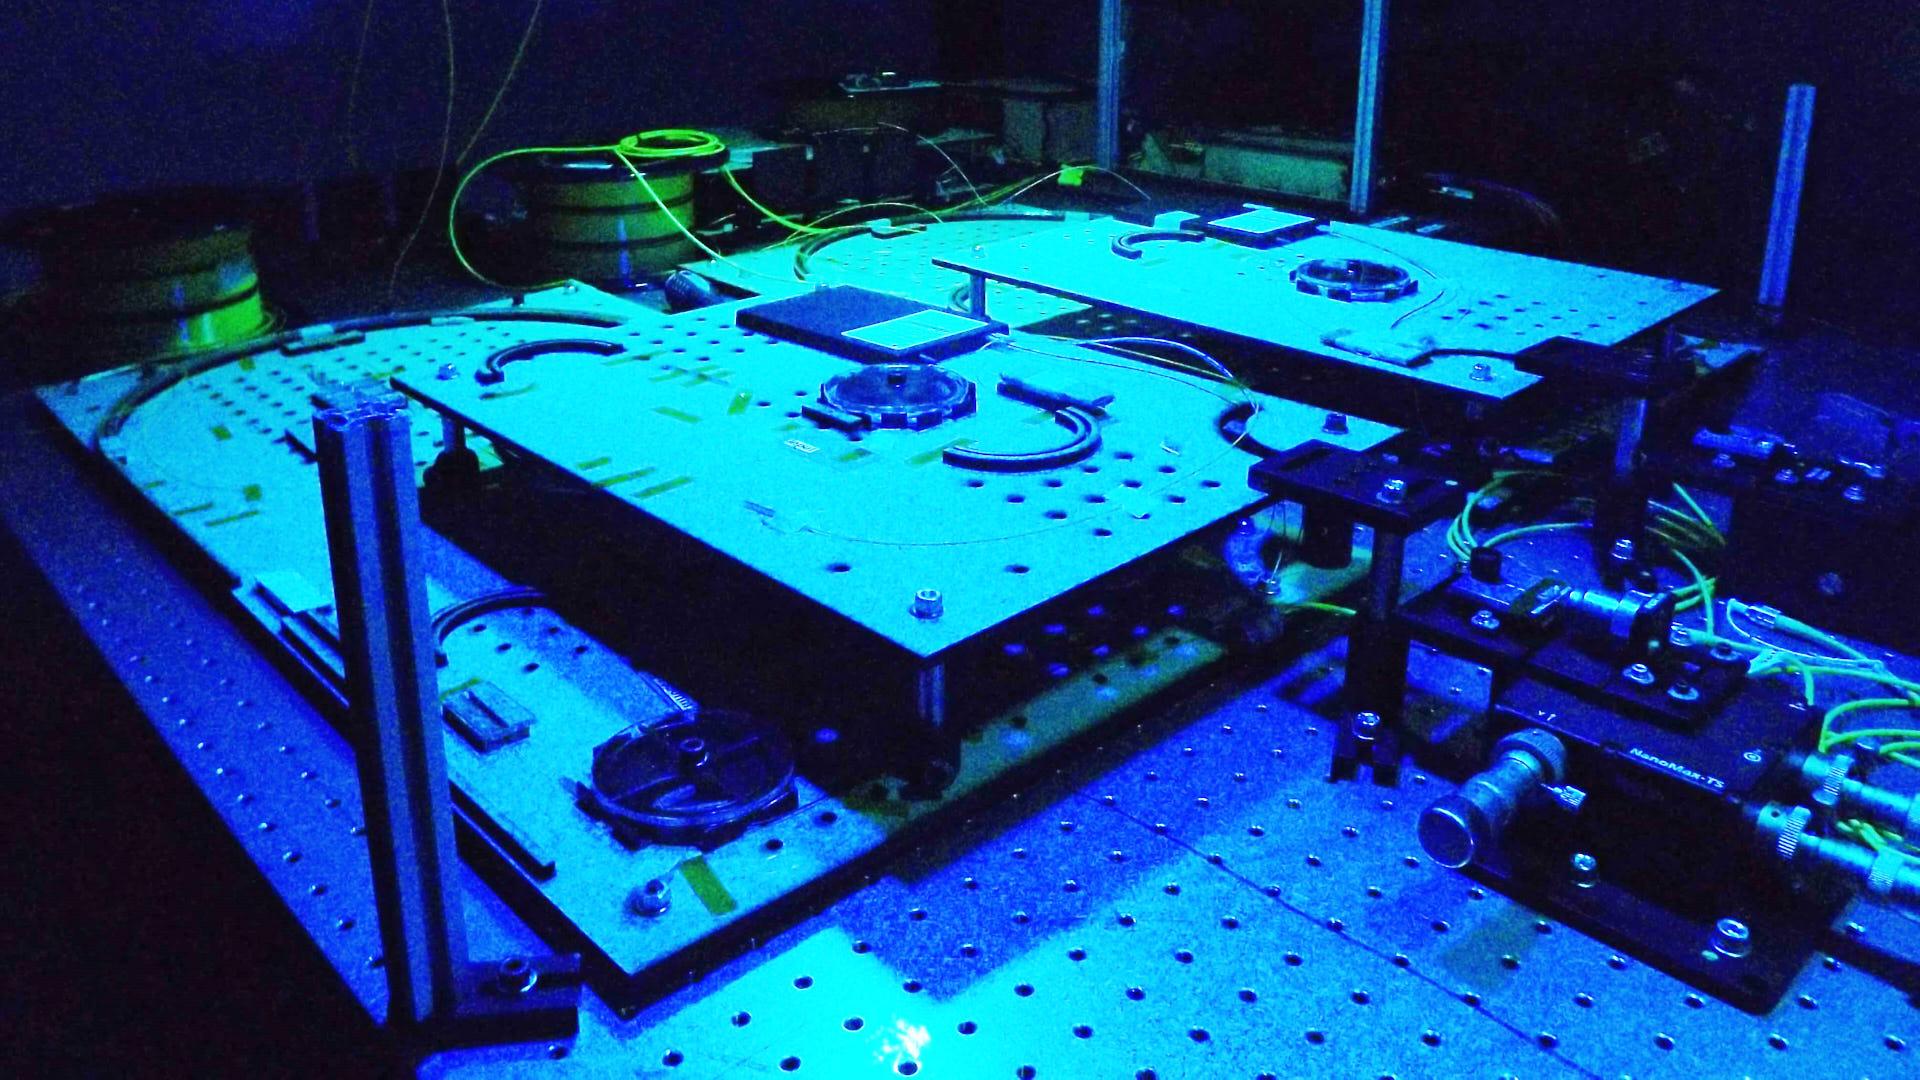 Photograph of a single photon source built with optical fibre